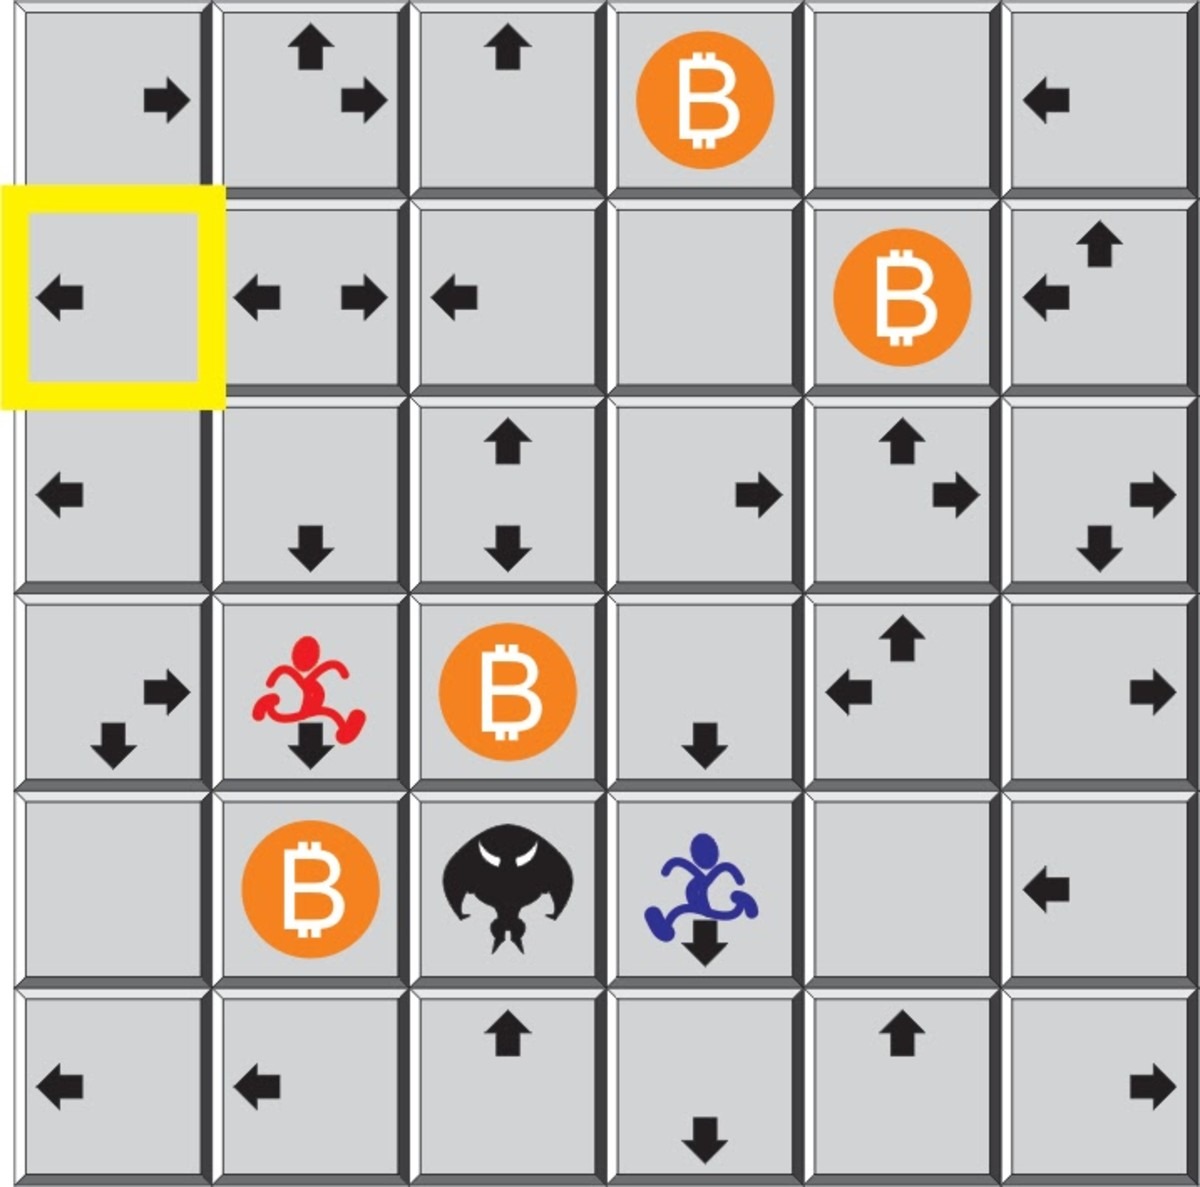 Figure 4: Challenge 3